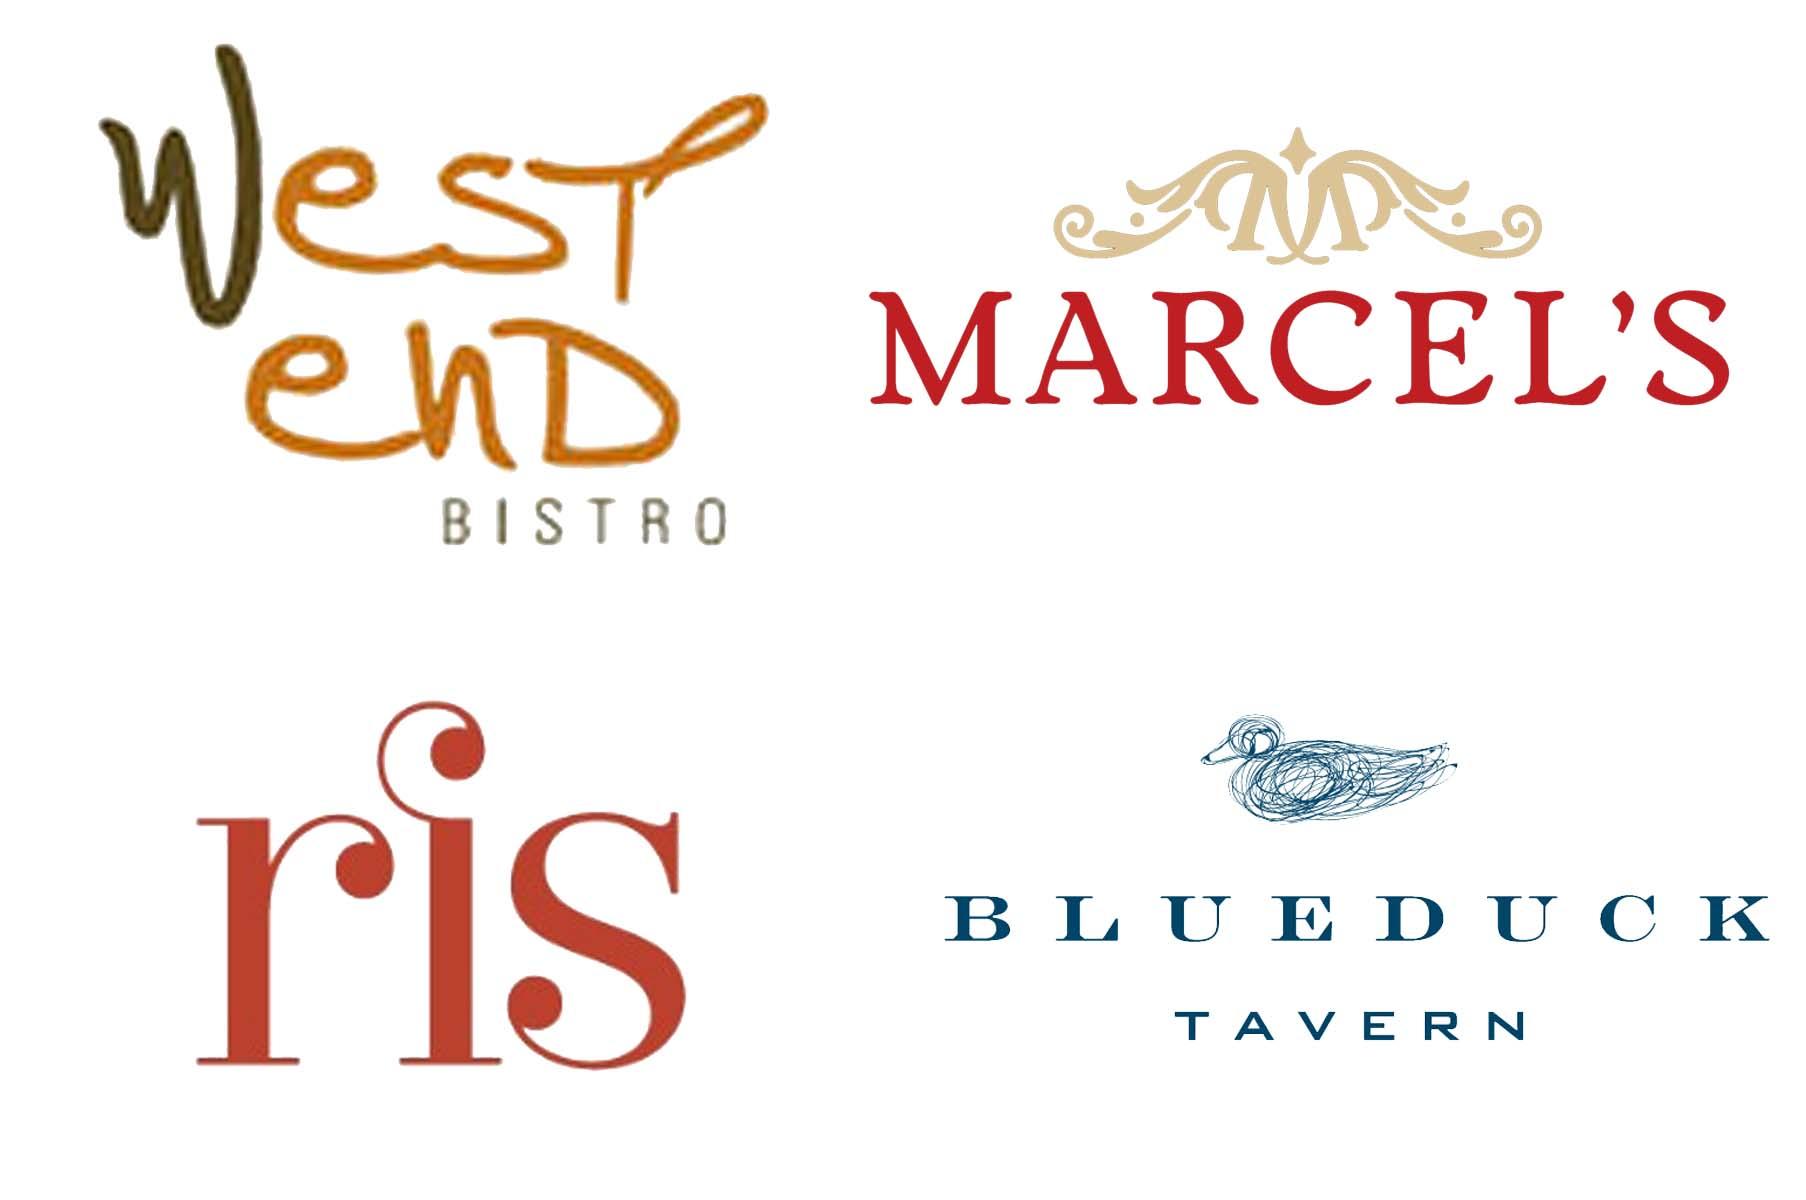 West End Wednesday, a progressive dinner series at West End Bistro, Marcel's, Ris and Blue Duck Tavern, ends July 30. (Illustraiton: Mark Heckathorn/DC on Heels)